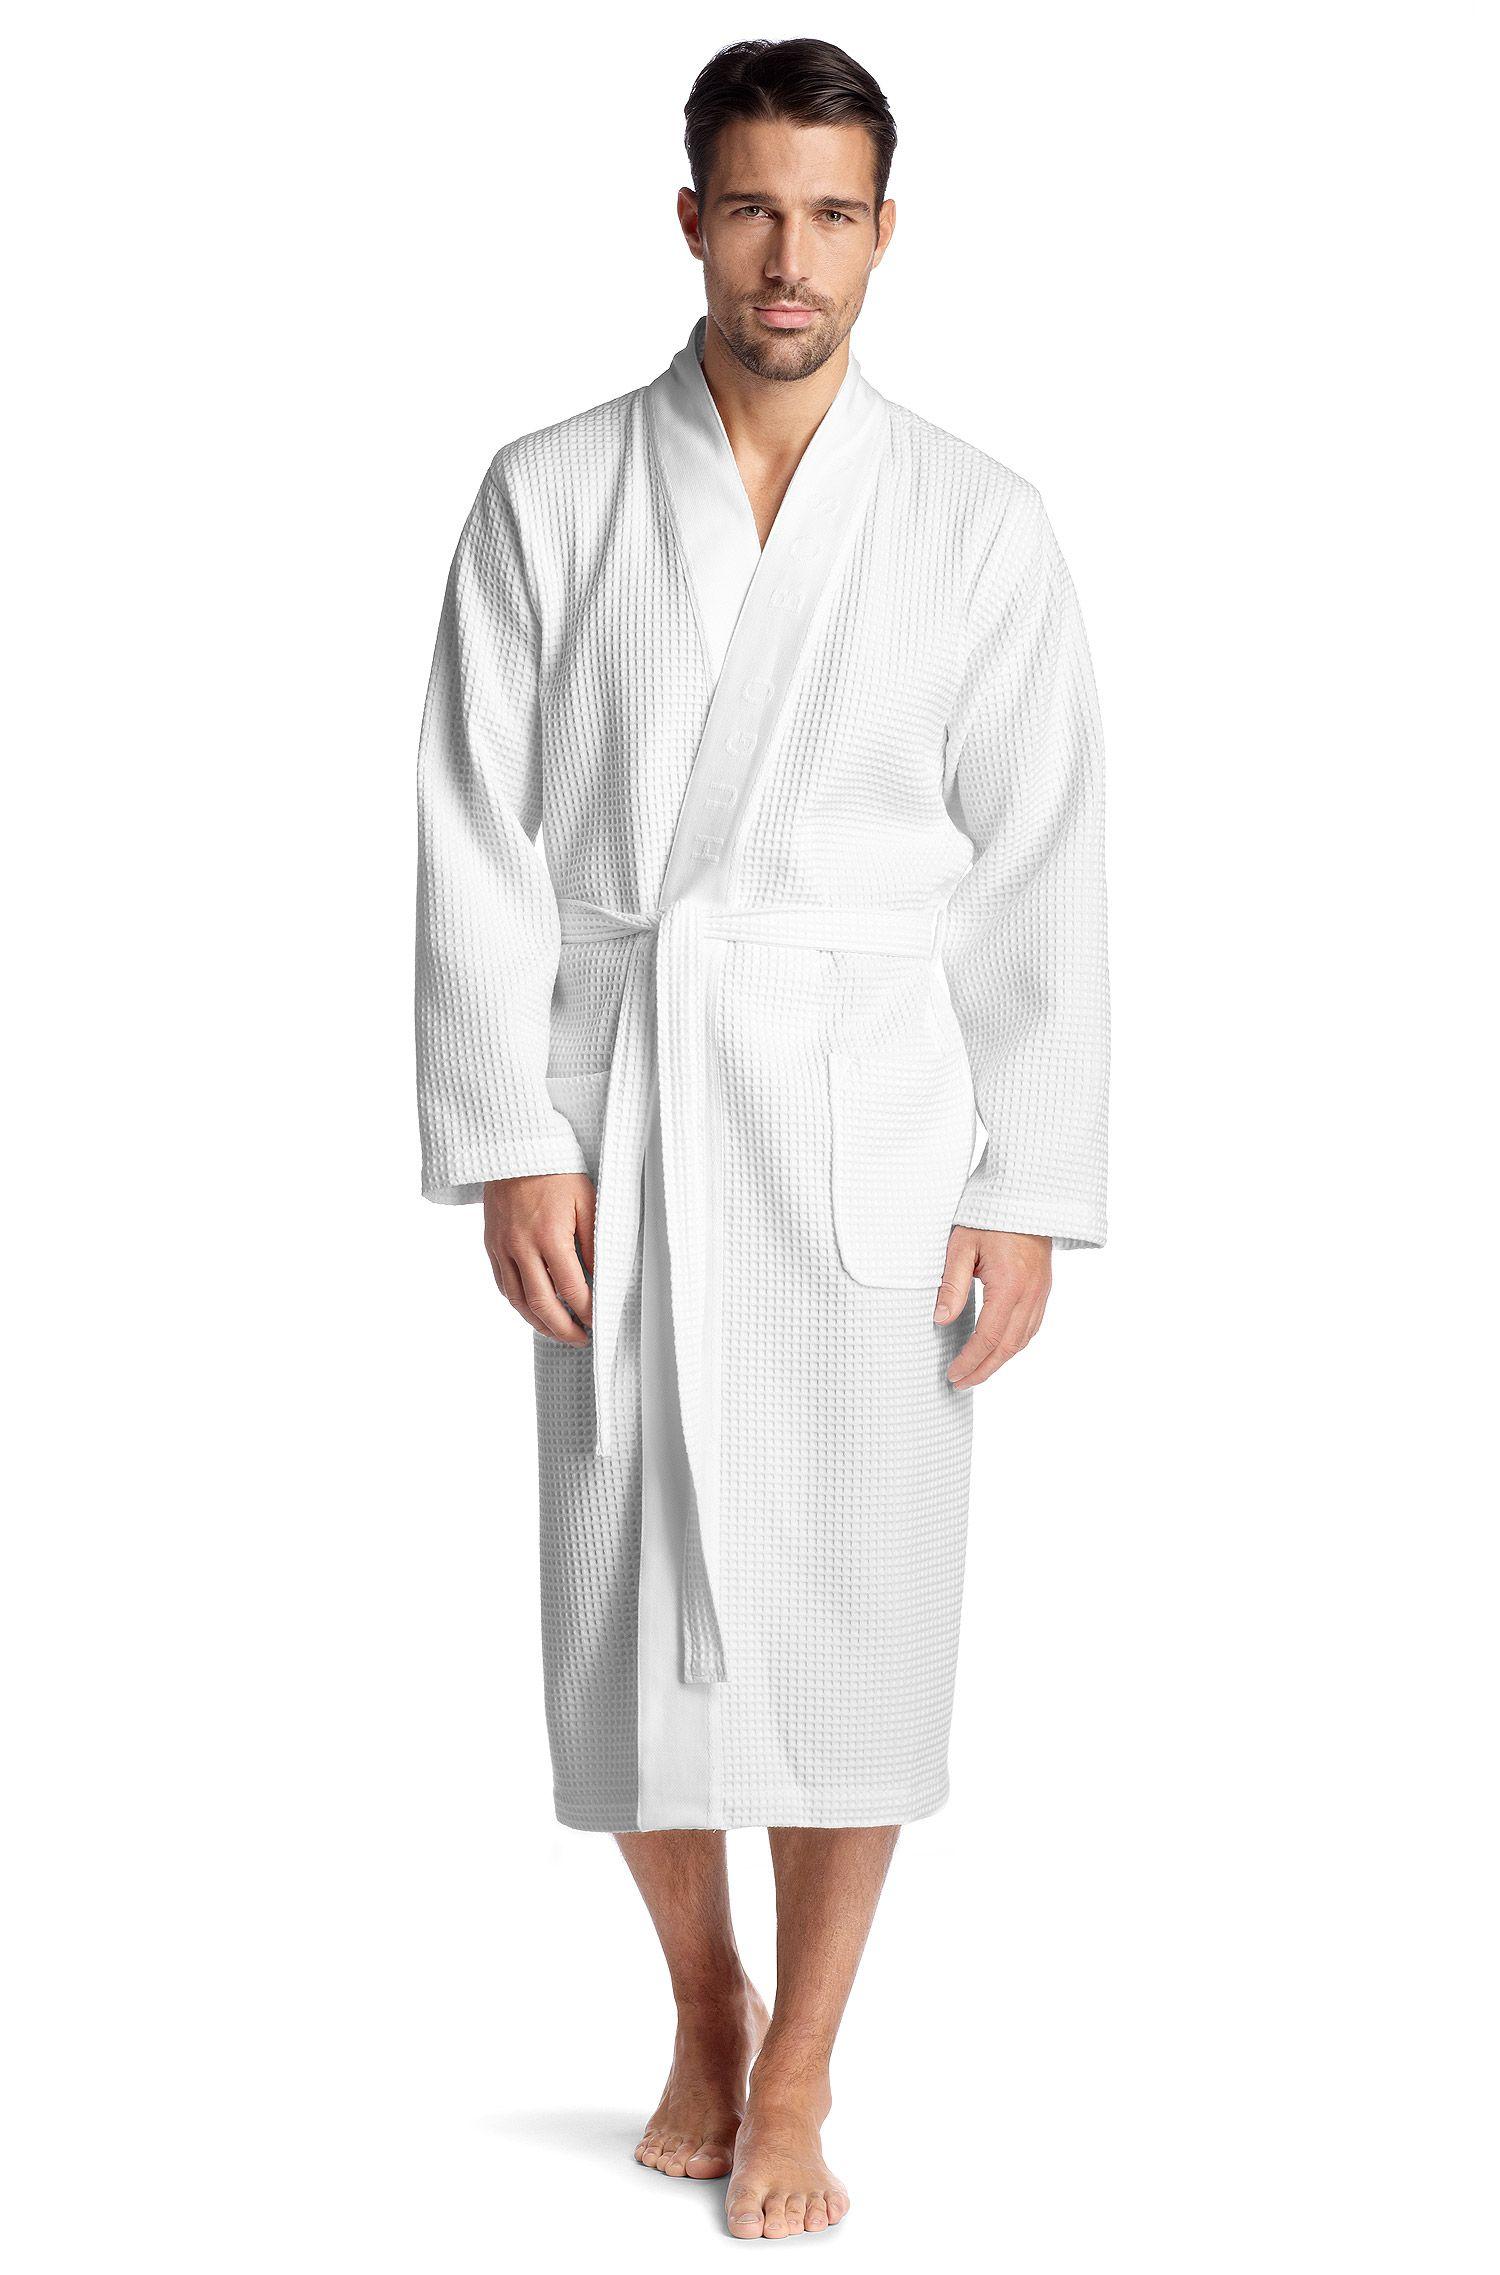 Kimono ´Kimono BM` aus atmungsaktivem Baumwoll-Mix